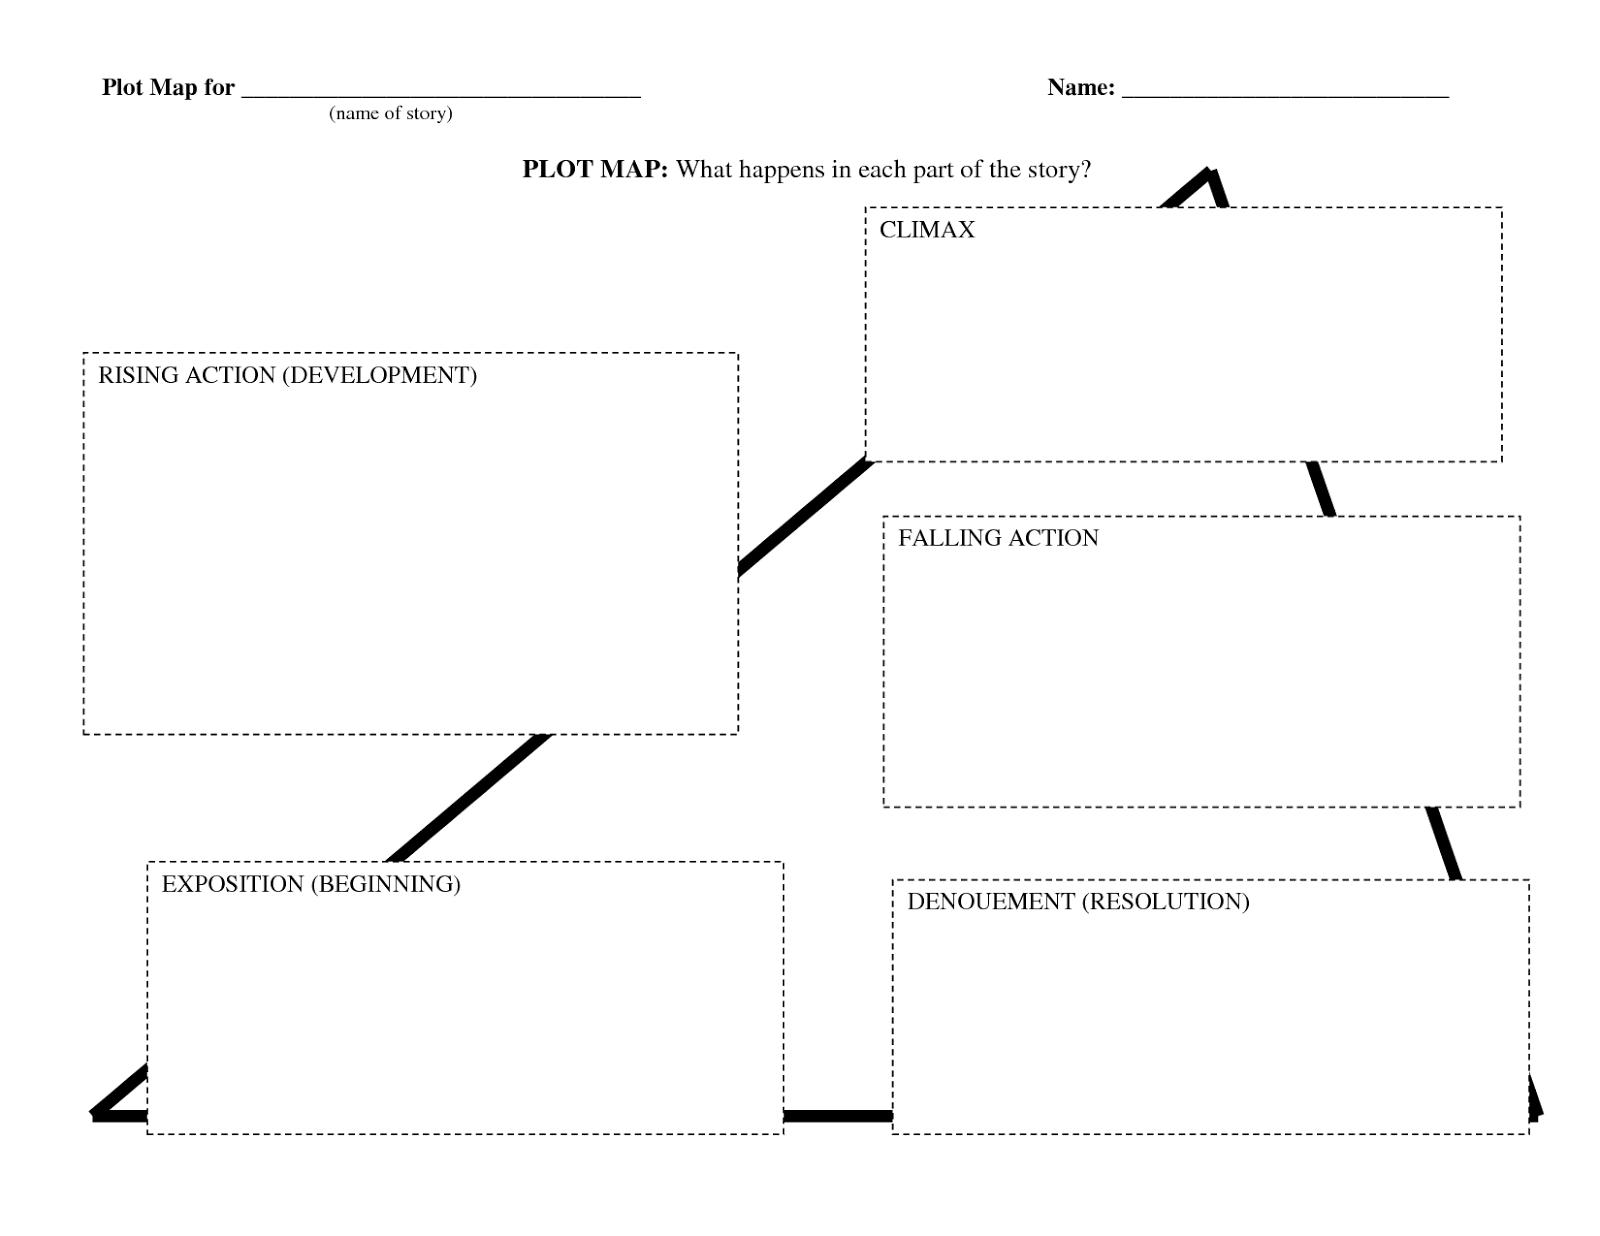 di croce st simon dec 18 novel study plot diagram prezi rh stsimondicroce blogspot com printable plot diagram story plot diagram example [ 1600 x 1236 Pixel ]